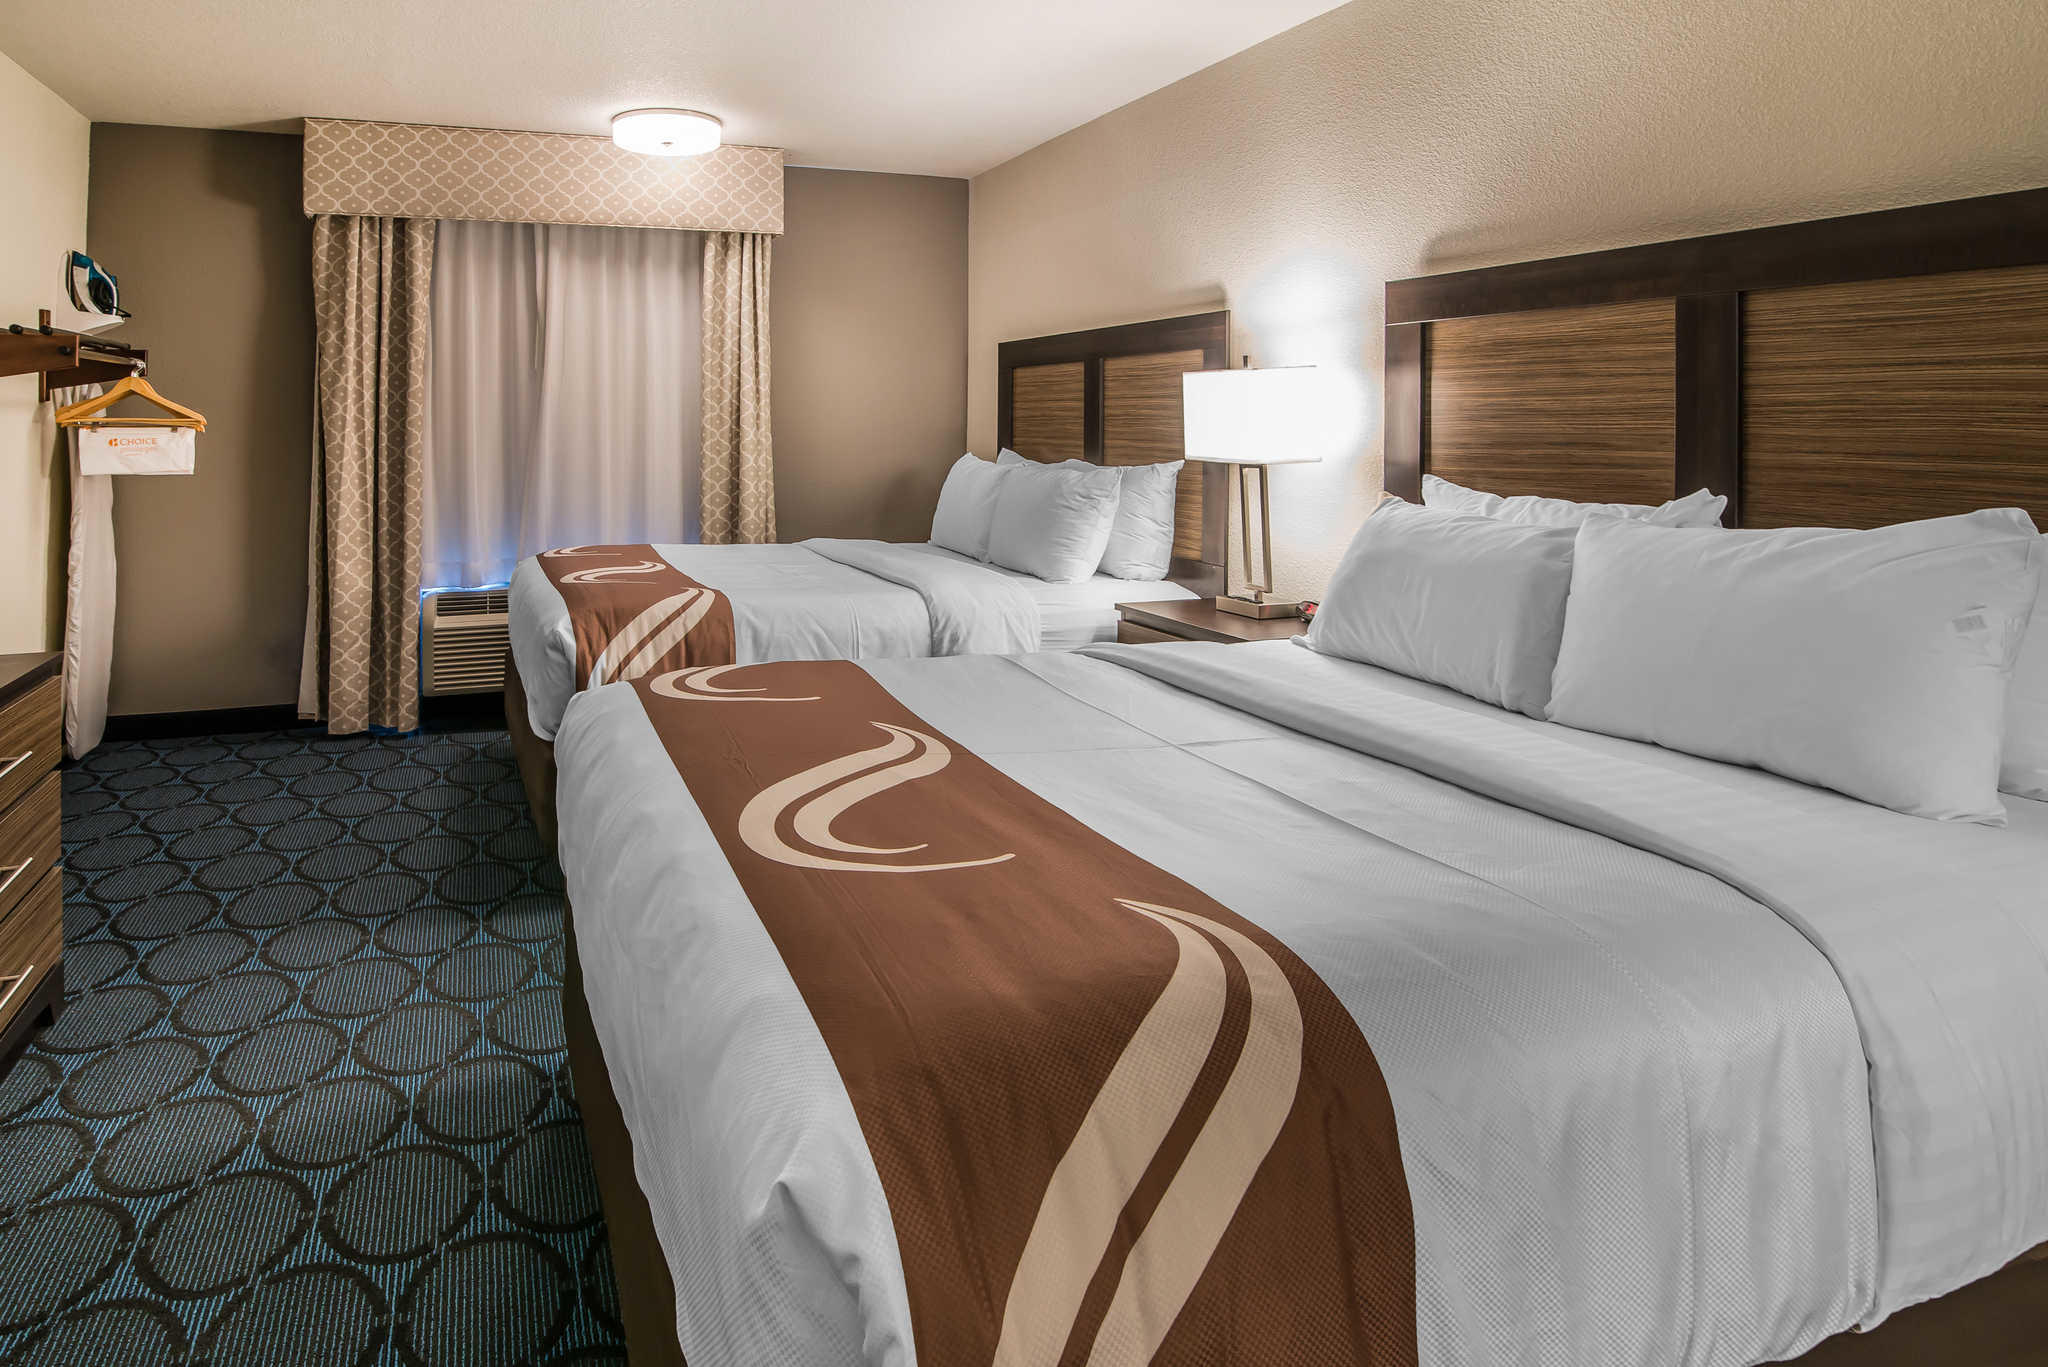 Quality Inn & Suites - Ruidoso Hwy 70 image 12